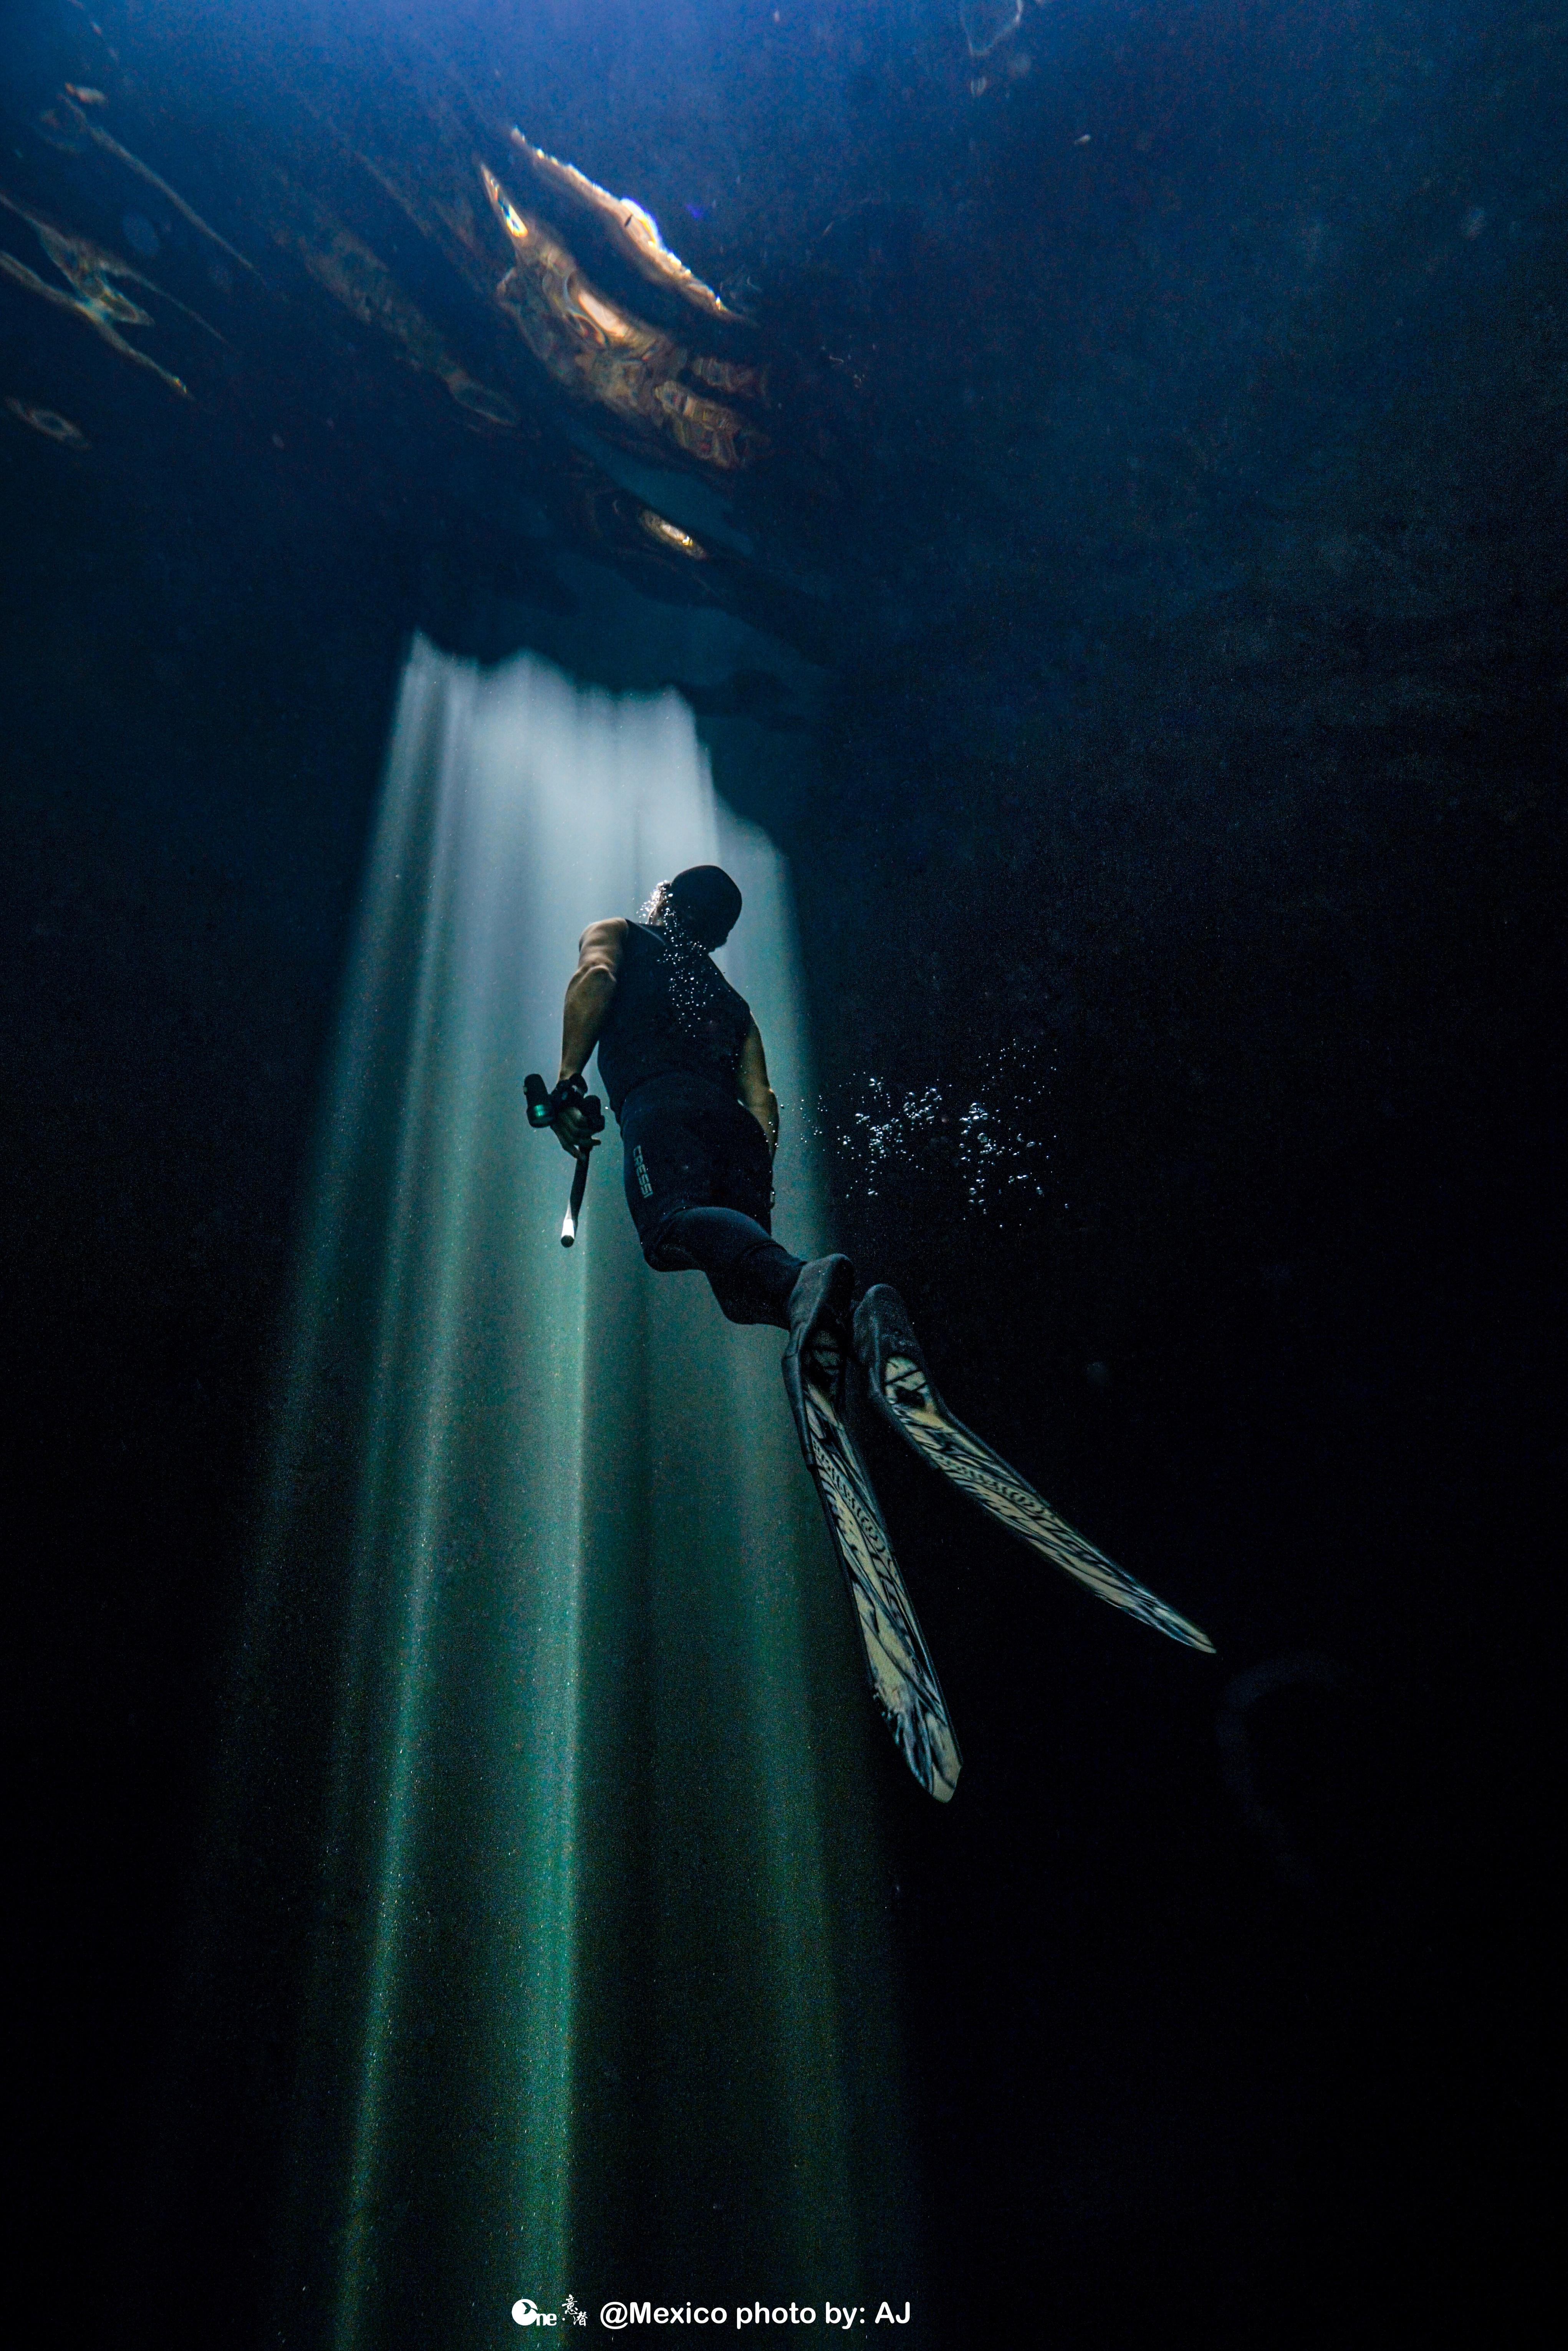 Freedive Tulum instructor cElvis James ascending into the light